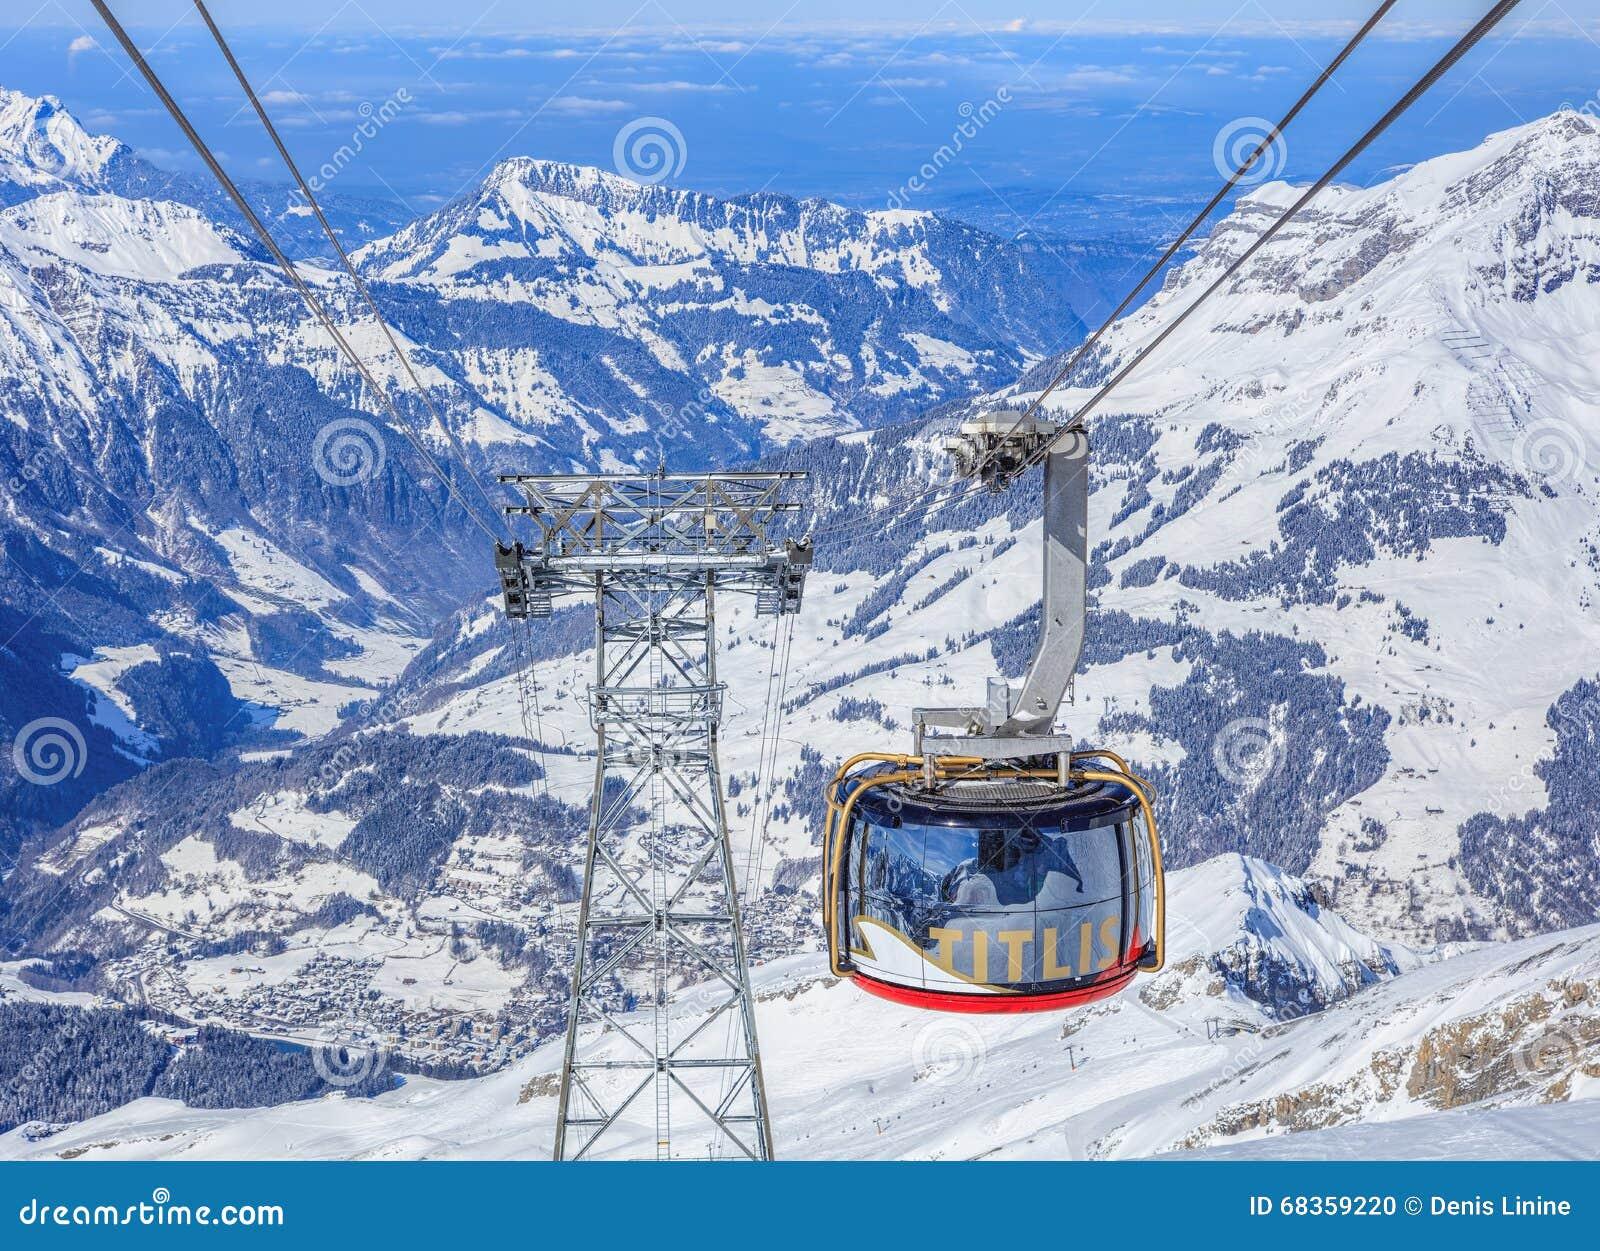 Switzerland Cable Car Prices